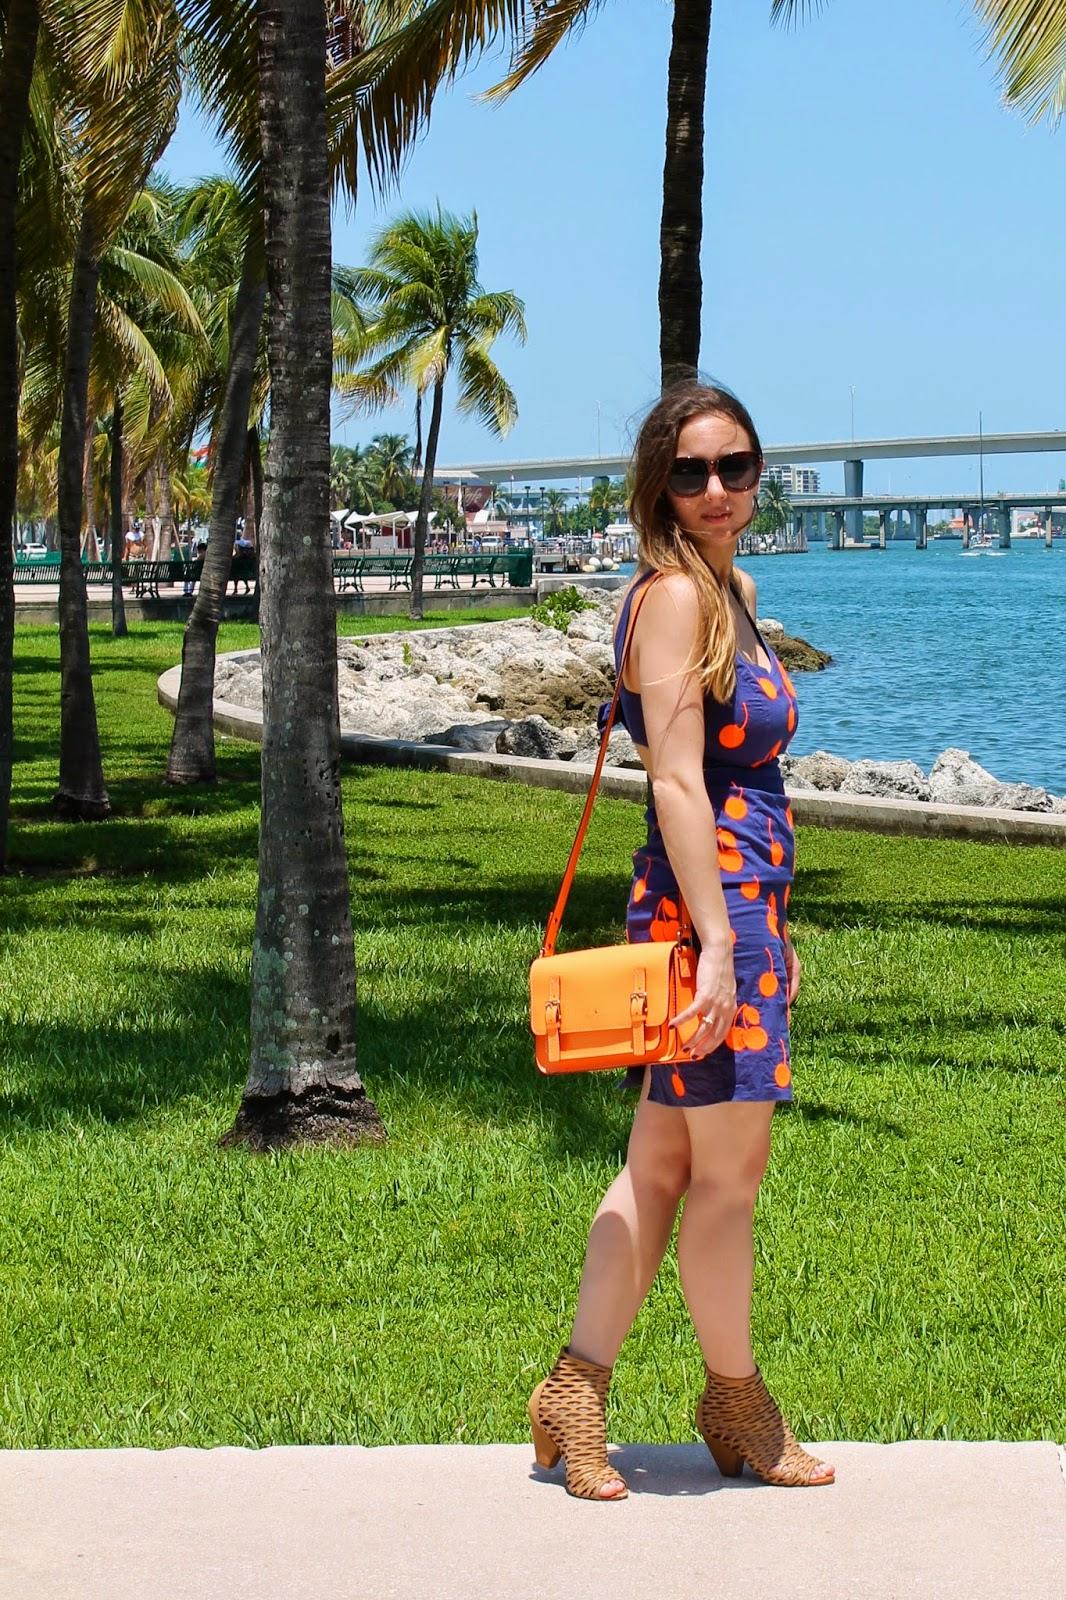 Anthropologie, Jeffrey Campbell, Kate Spade, BCBGeneration, Nordstrom, classic, retro, feminine, romantic, Palm Beach, Miami, Miami blogger, Miami fashion blog, fashion, style, lookbook, what I wore, ootd